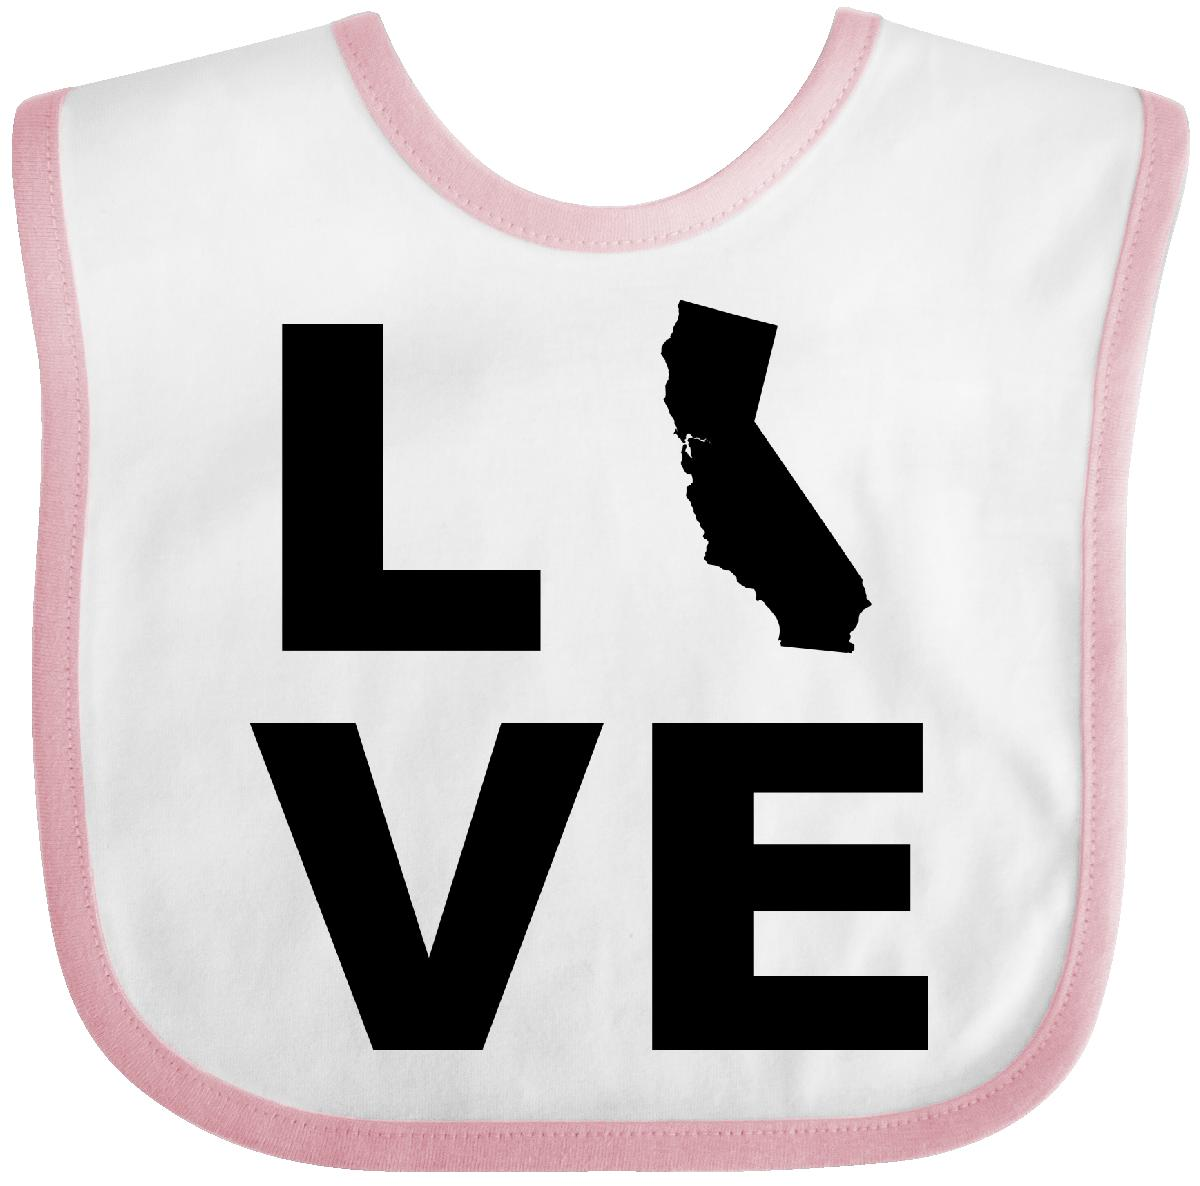 Inktastic-Love-California-Baby-Bib-State-Support-Gift-Usa-America-Clothing